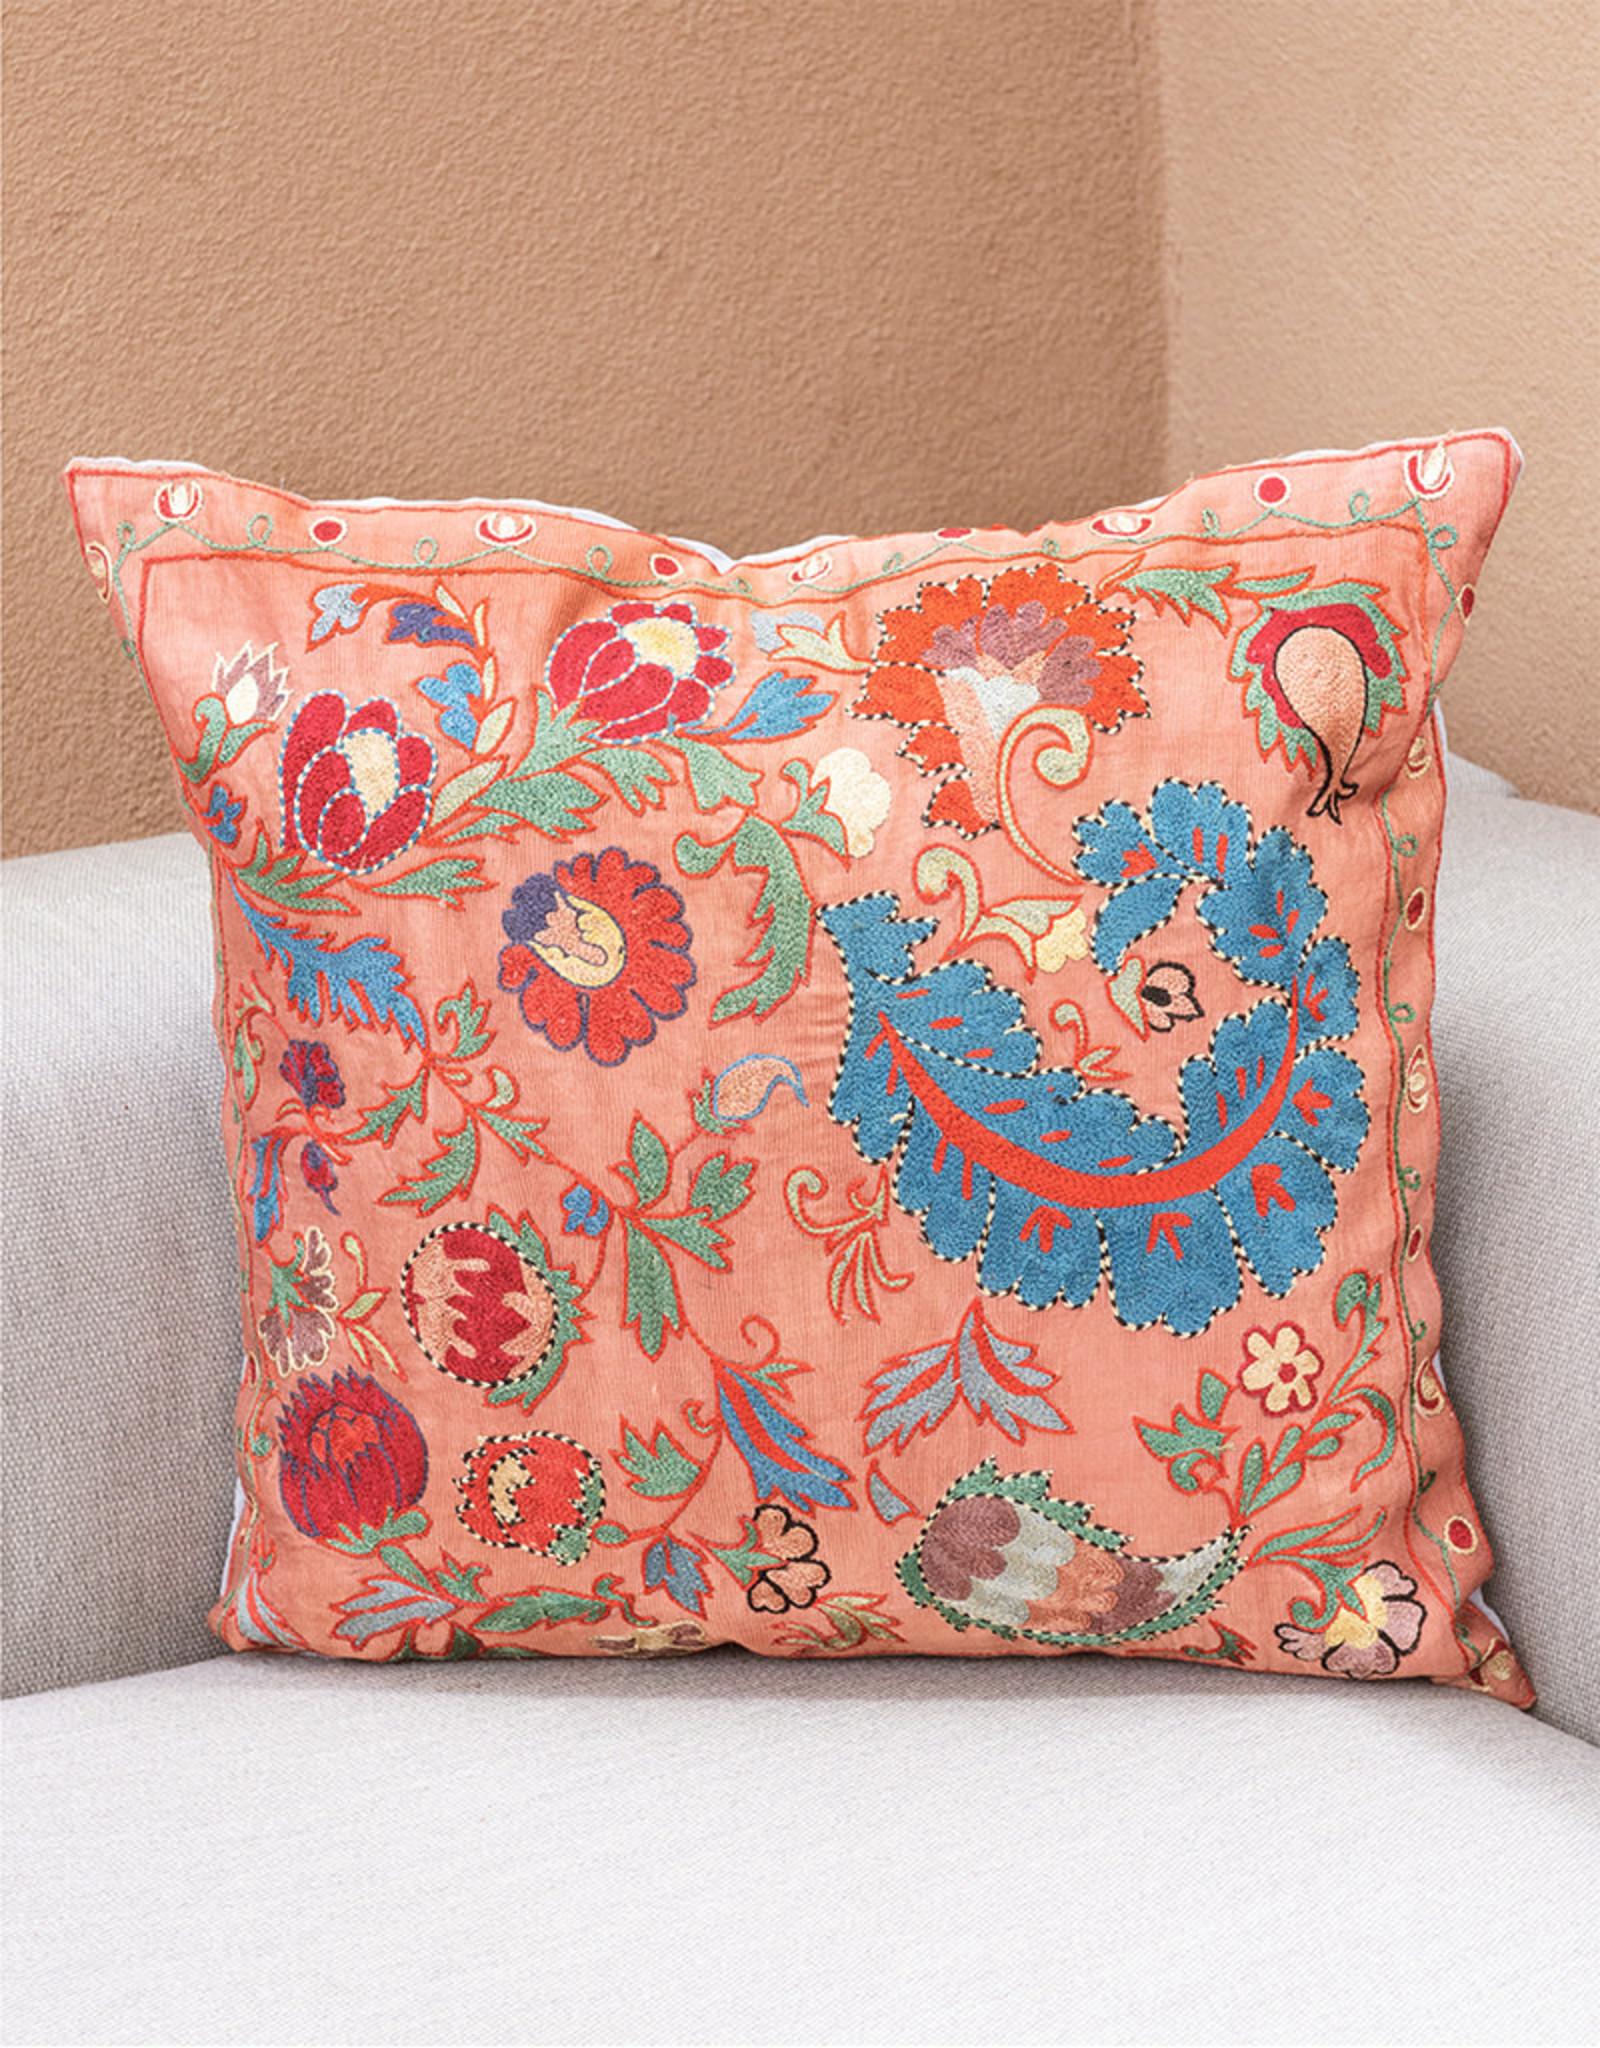 Nazarov Family Arabesque Pillow Rose III